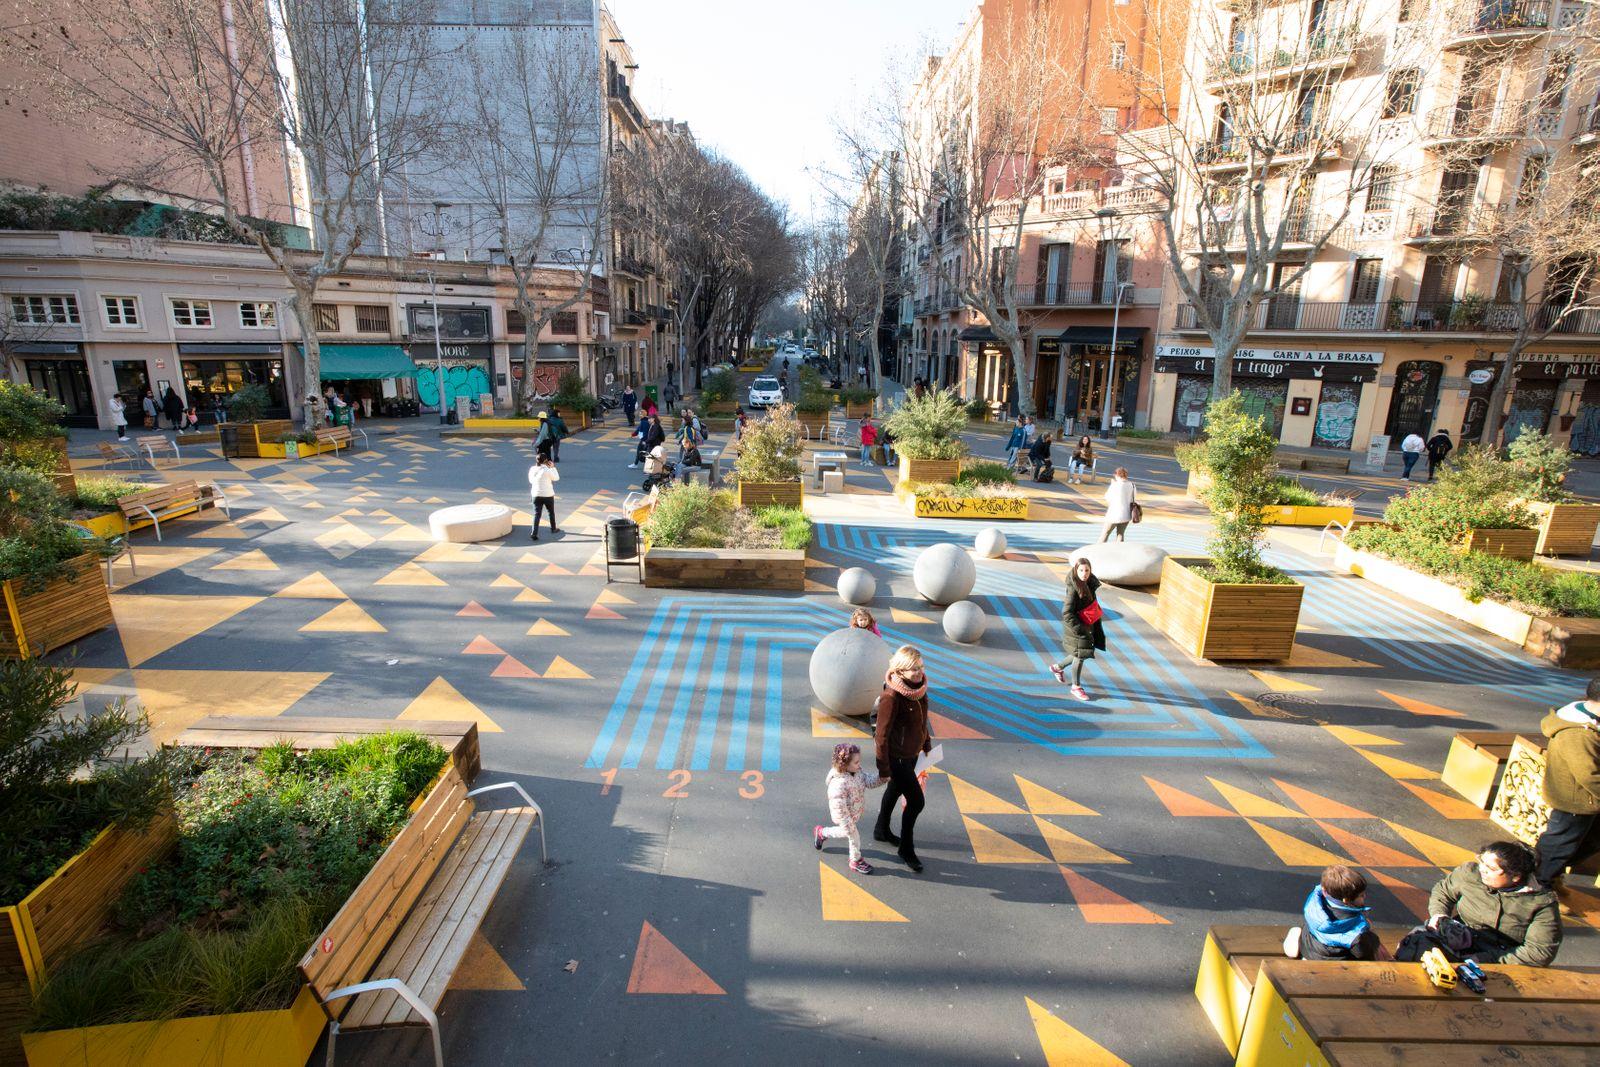 Spanien, Katalonien, Barcelona, Superblock Projekt, Stadtteil Sant Antoni, Superblock Cale del Conde Borrel mit Calle Parlament.